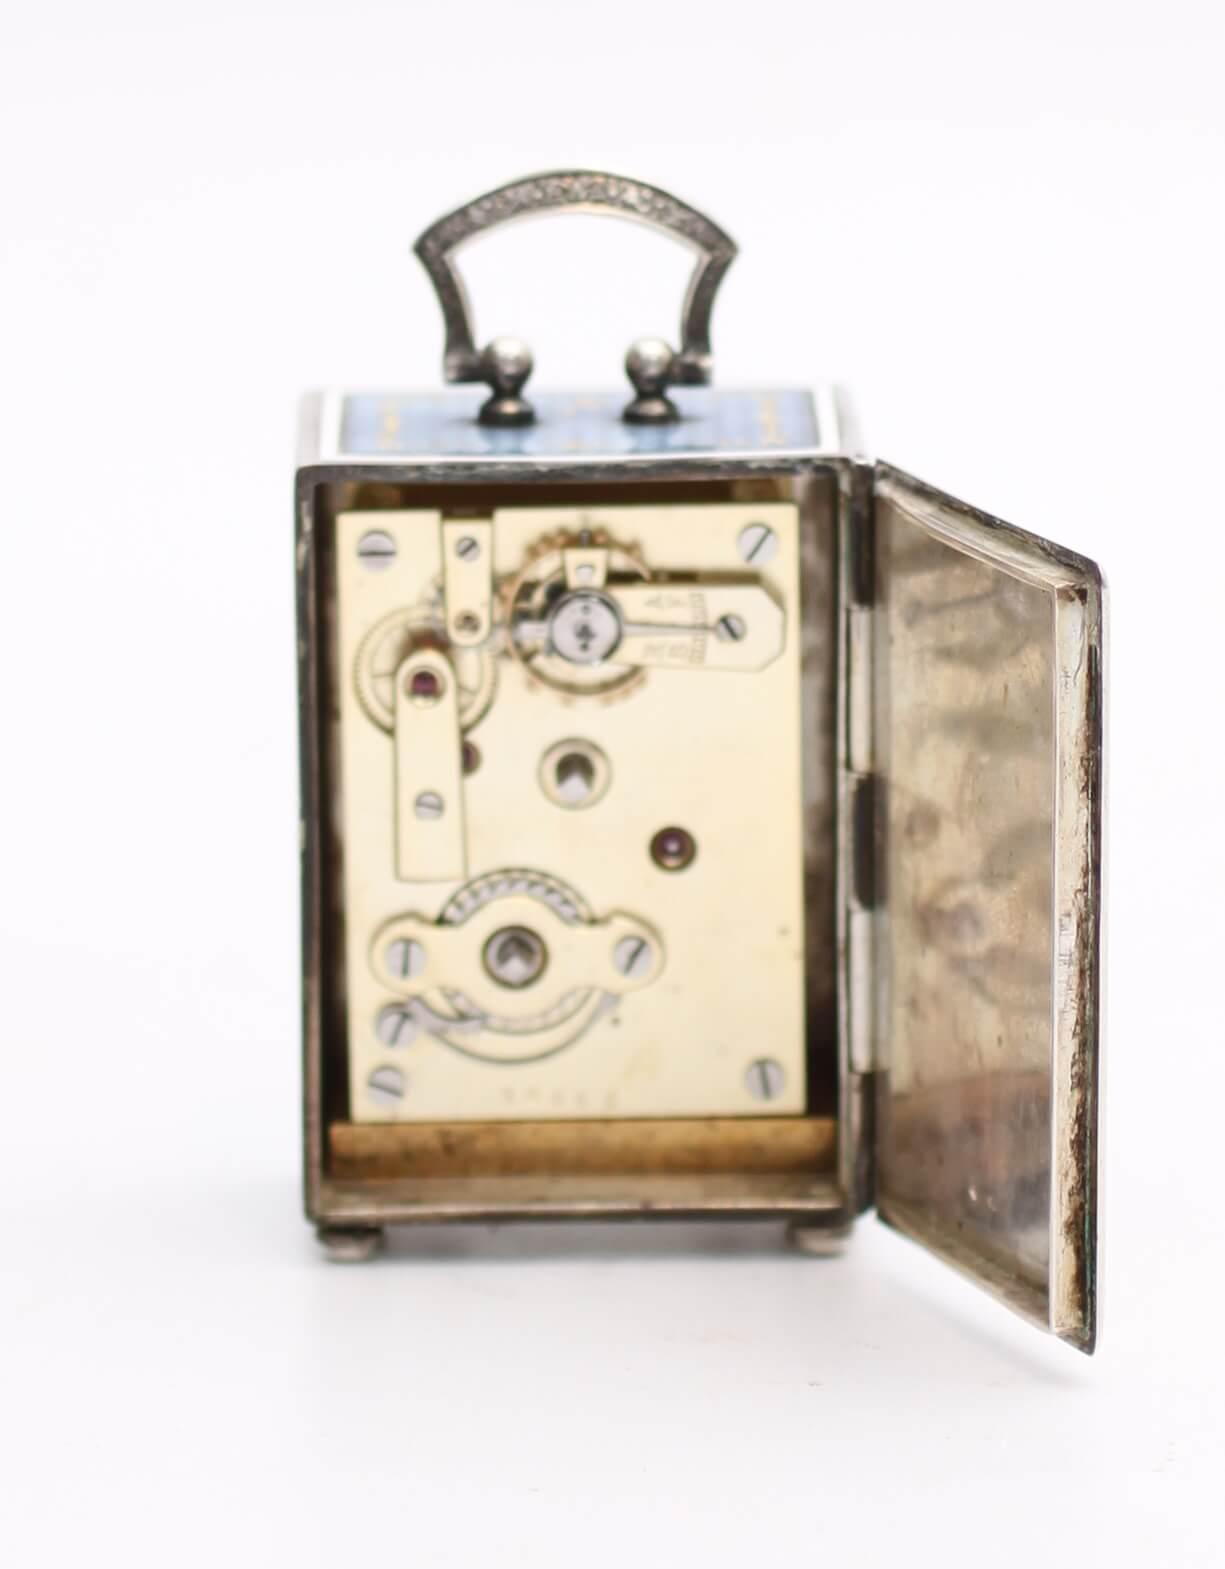 Swiss guilloche translucent enamel silver miniature travel clock